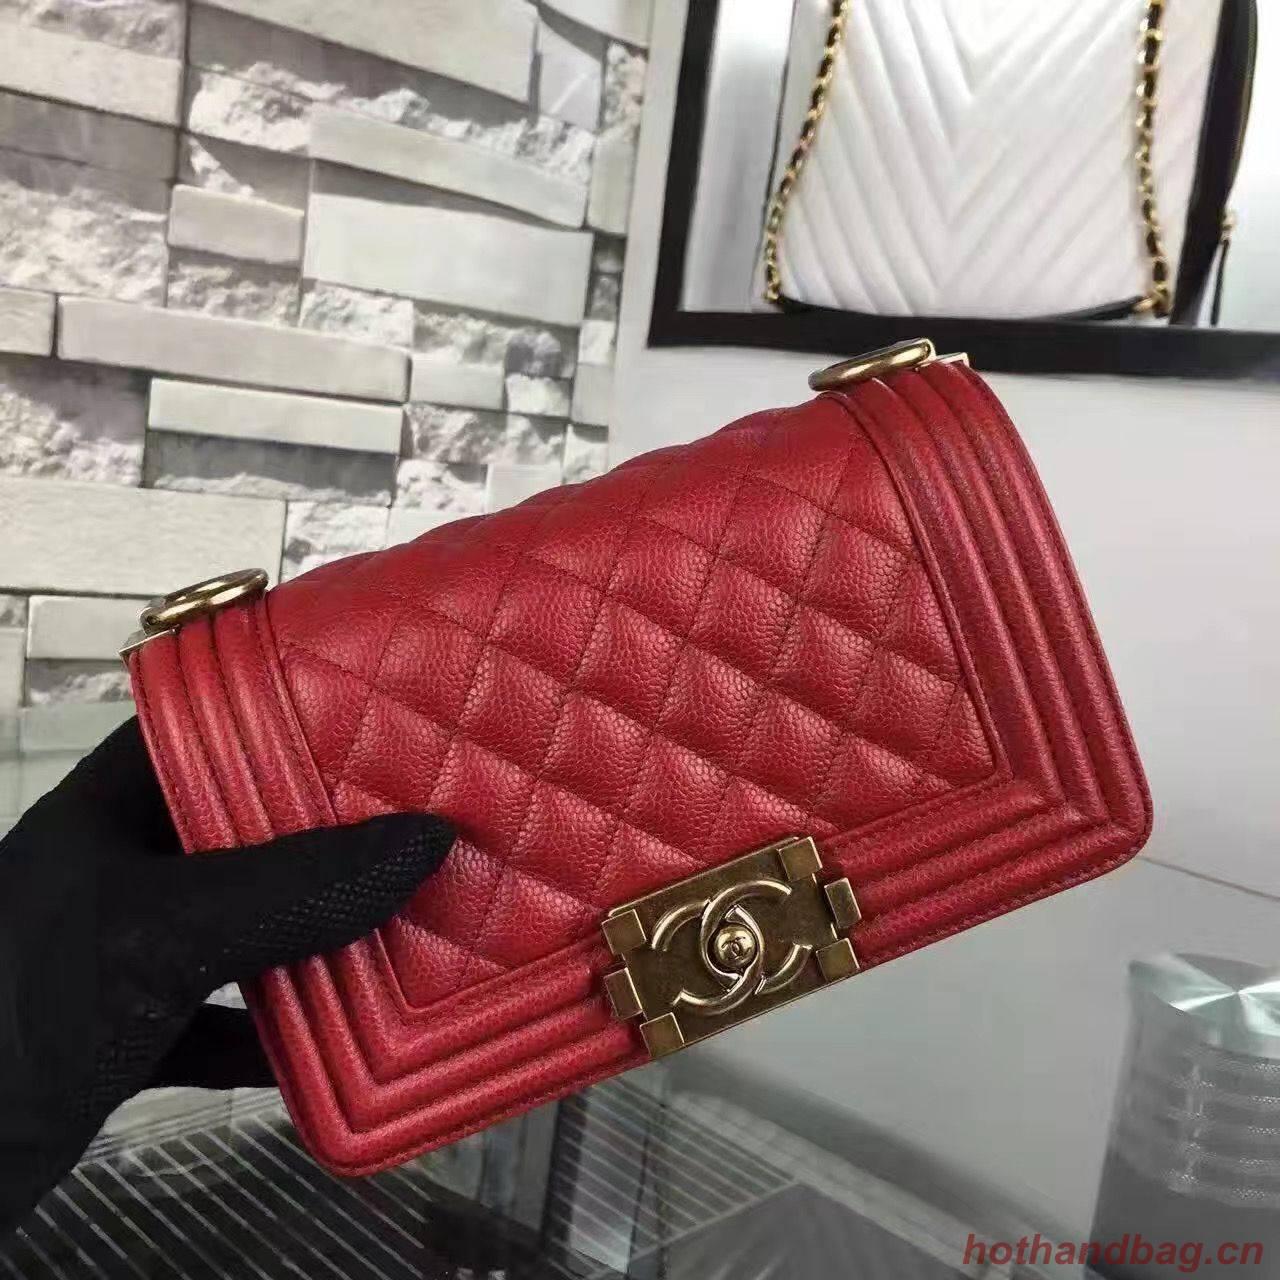 Chanel Le Boy Flap Shoulder Bag Original Cavier Leather A67085 Red Gold Buckle